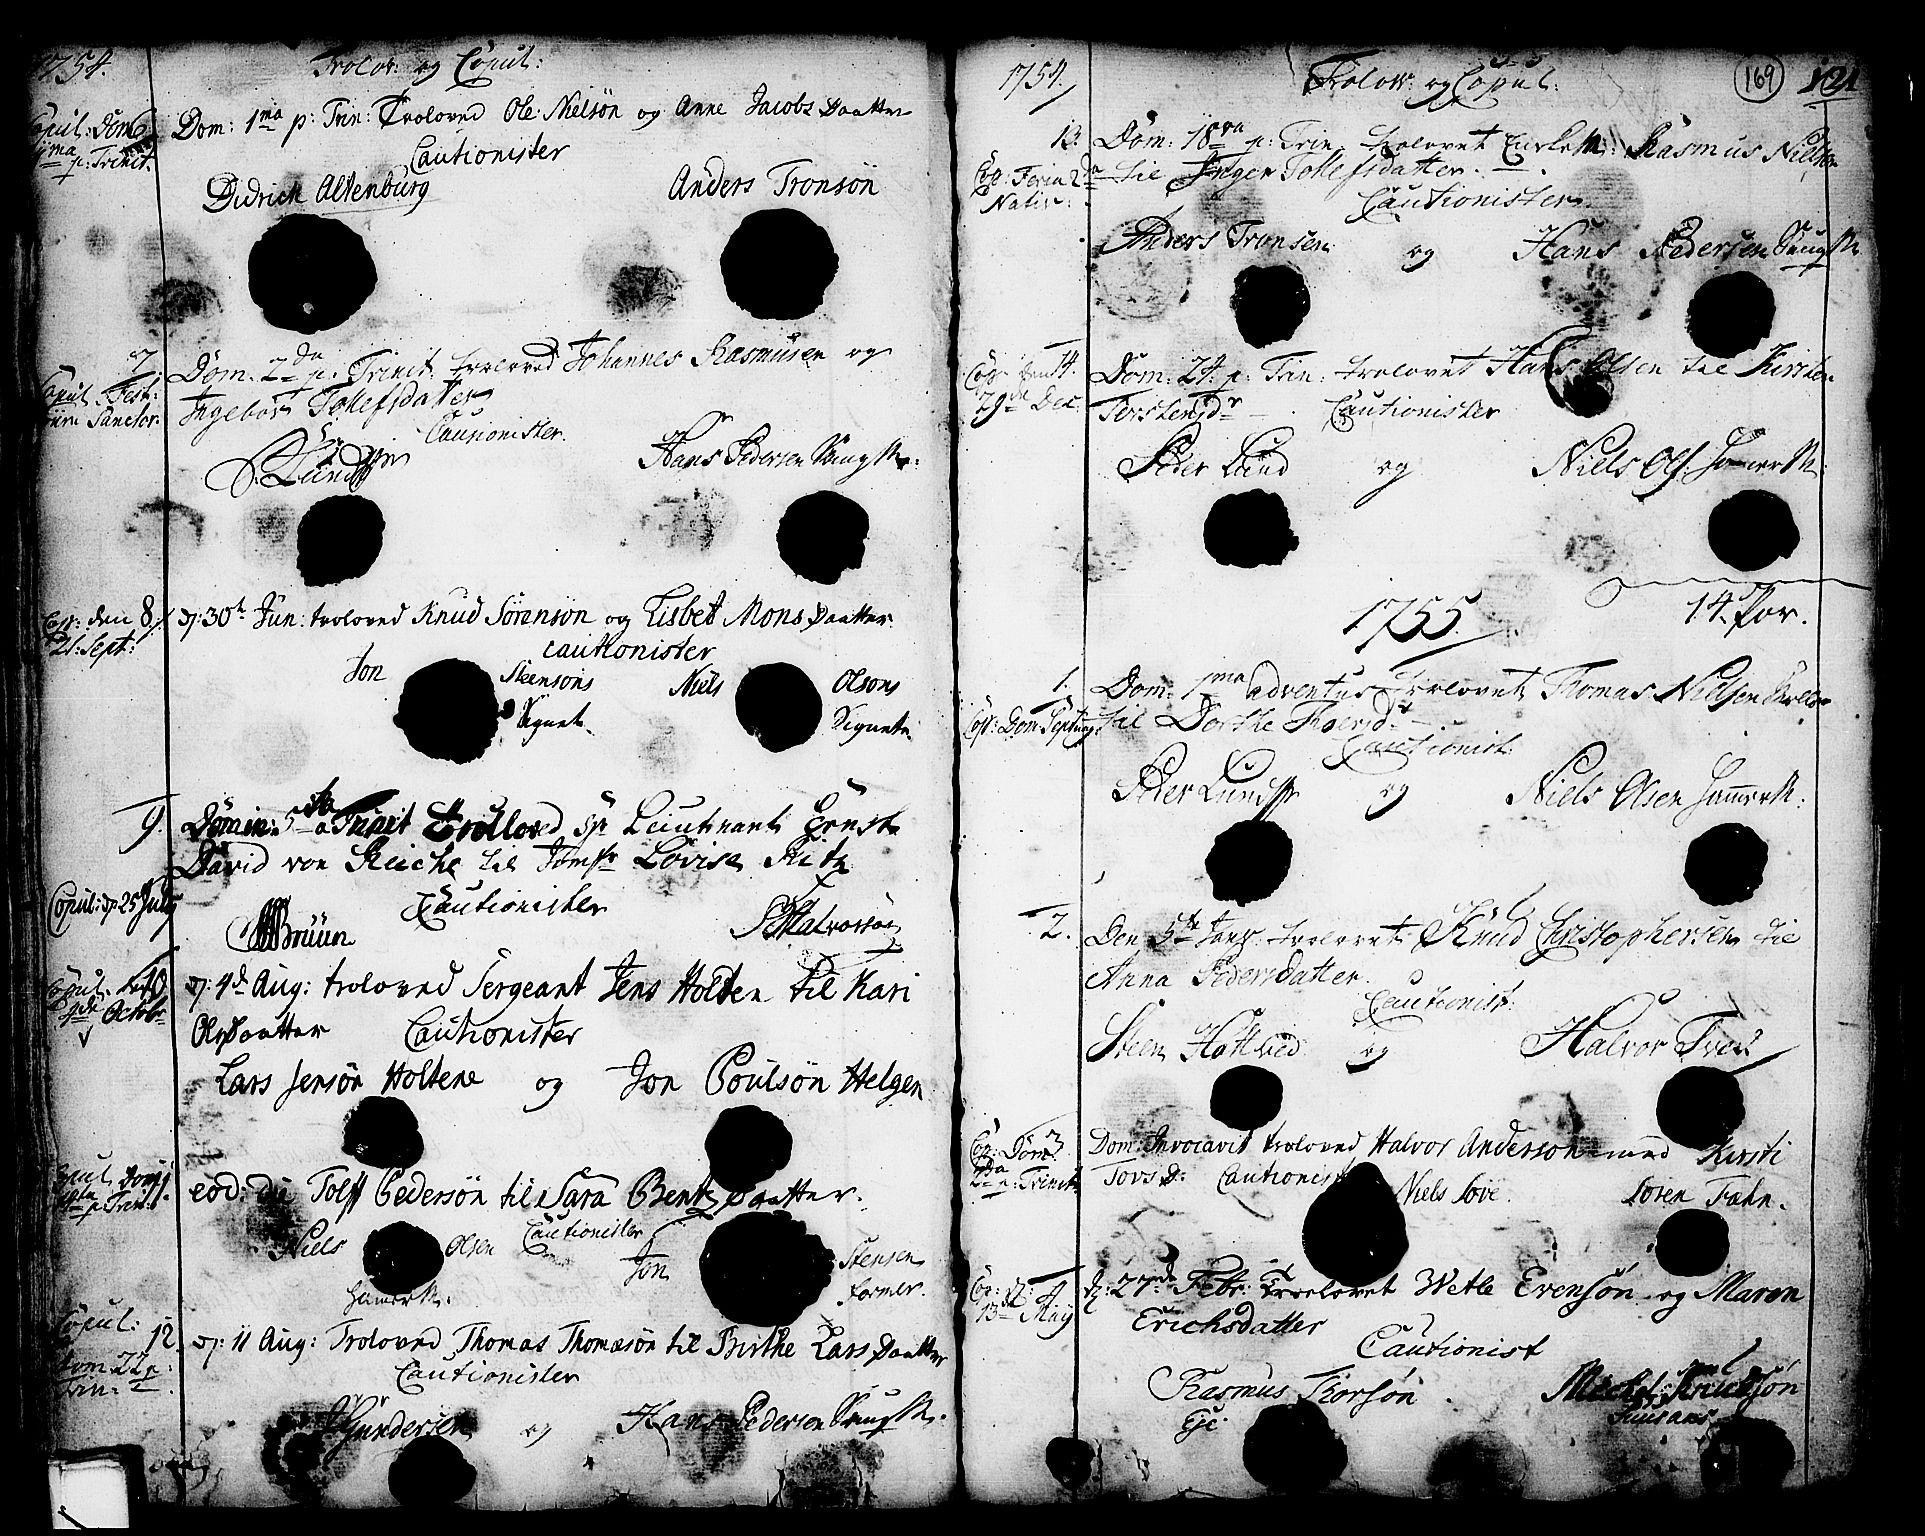 SAKO, Holla kirkebøker, F/Fa/L0001: Ministerialbok nr. 1, 1717-1779, s. 169